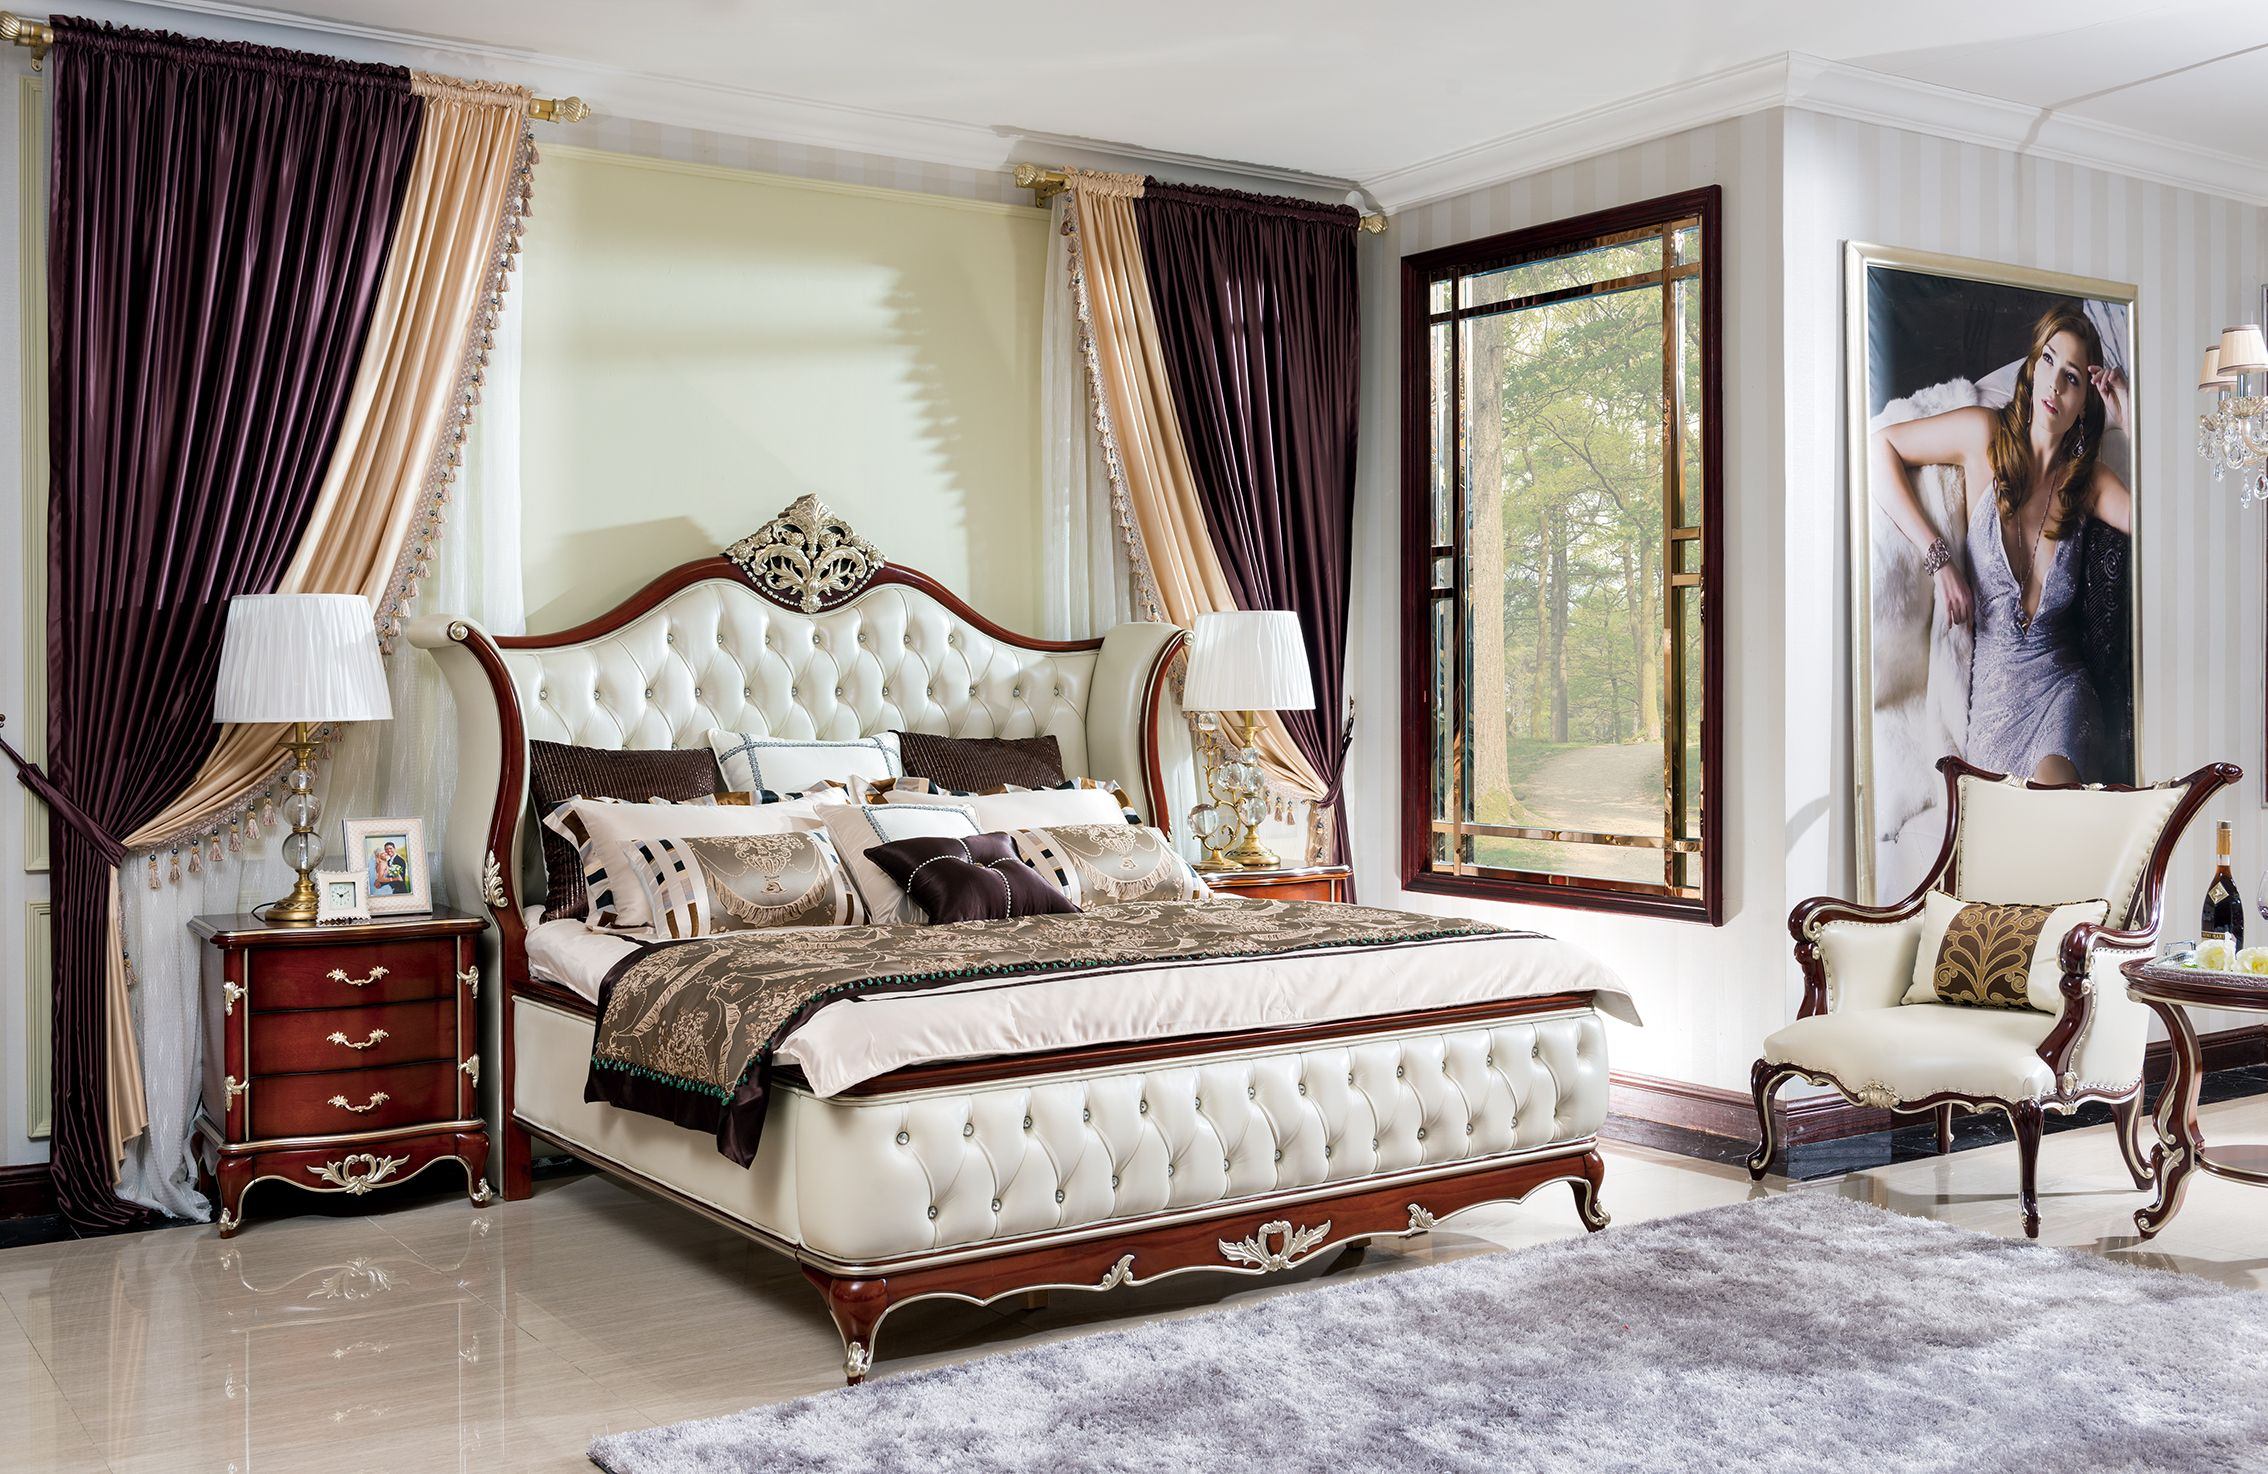 royal bedroom sets - HD2268×1474